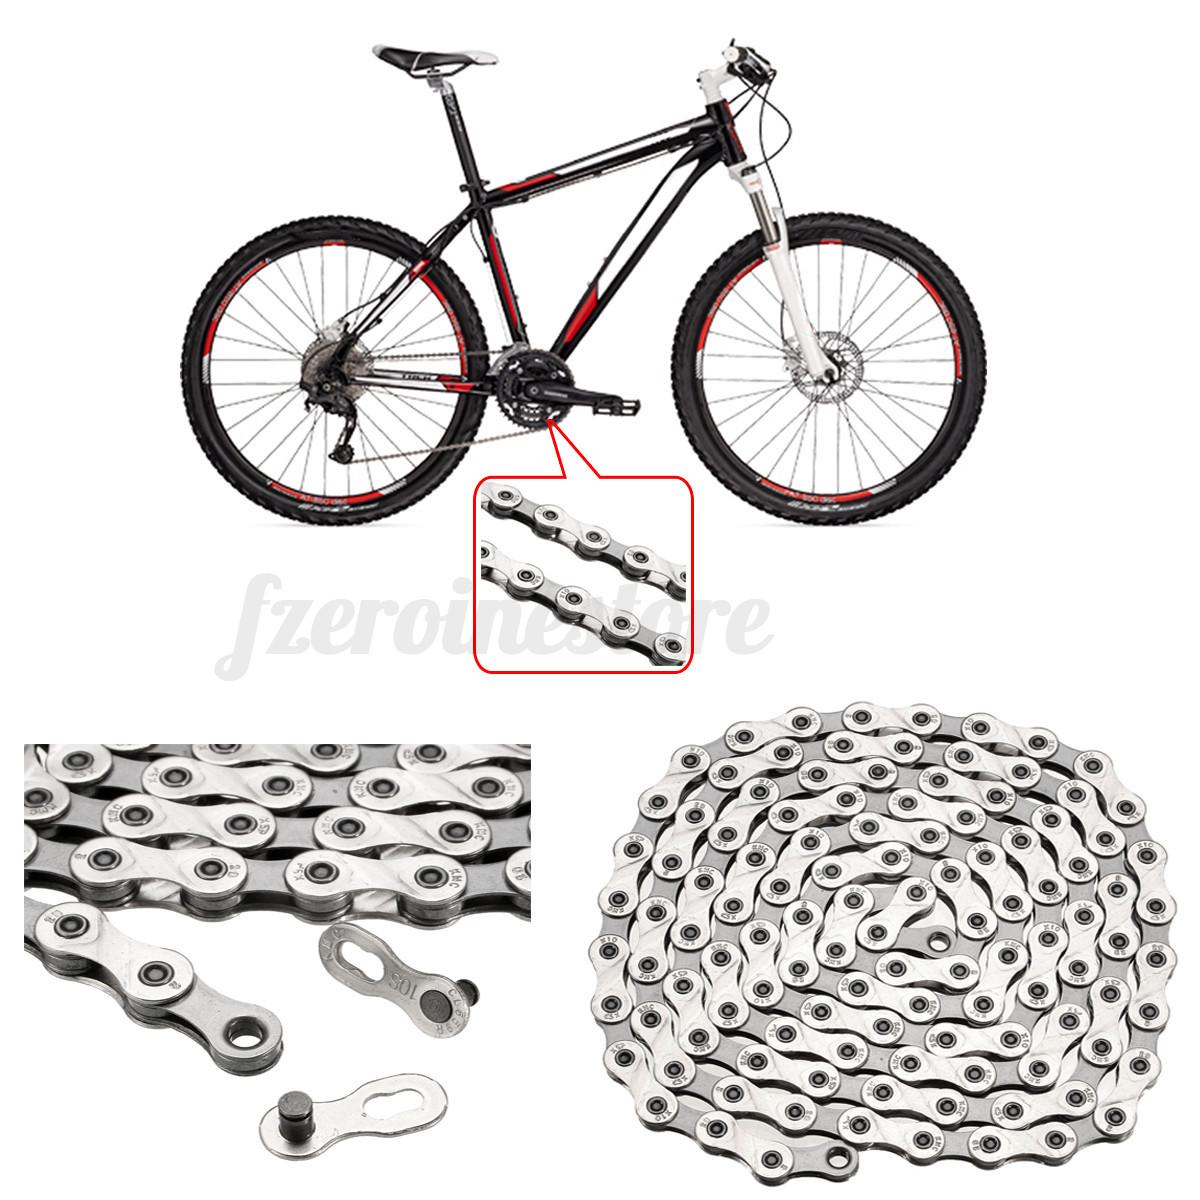 fahrradkette fahrrad kette mtb gangschaltung 9 fach 116. Black Bedroom Furniture Sets. Home Design Ideas